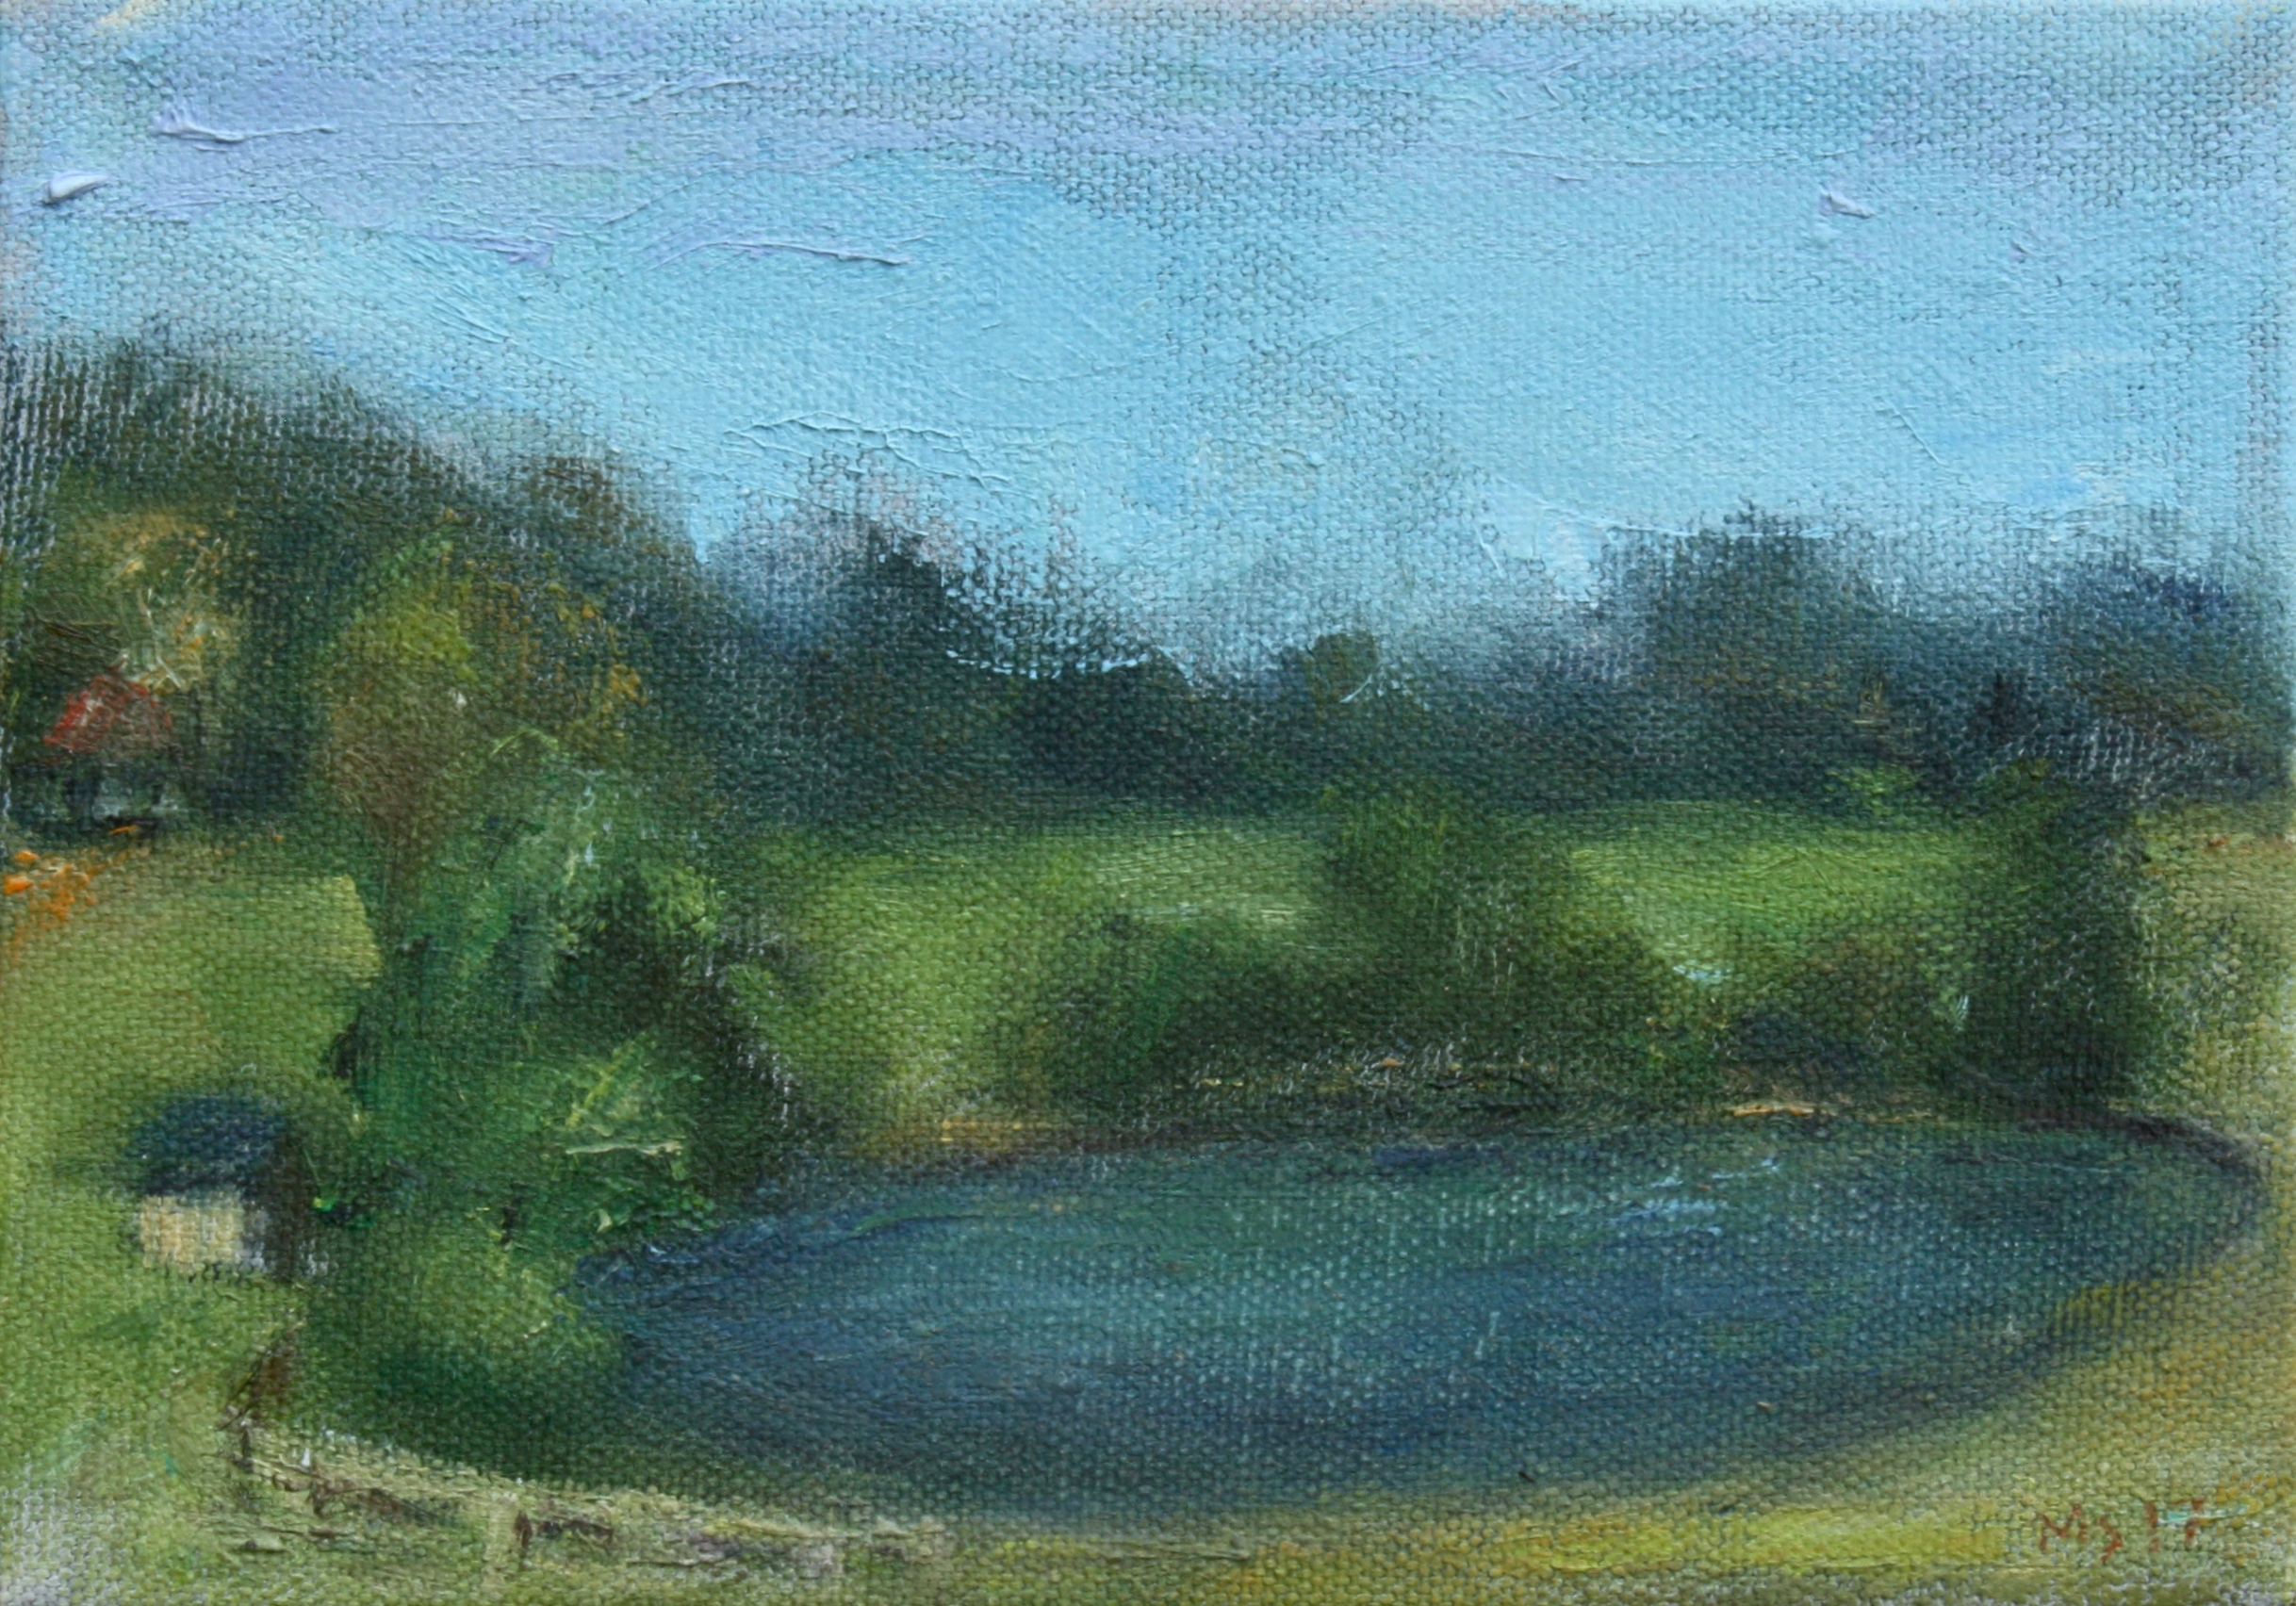 Ruff's Pond